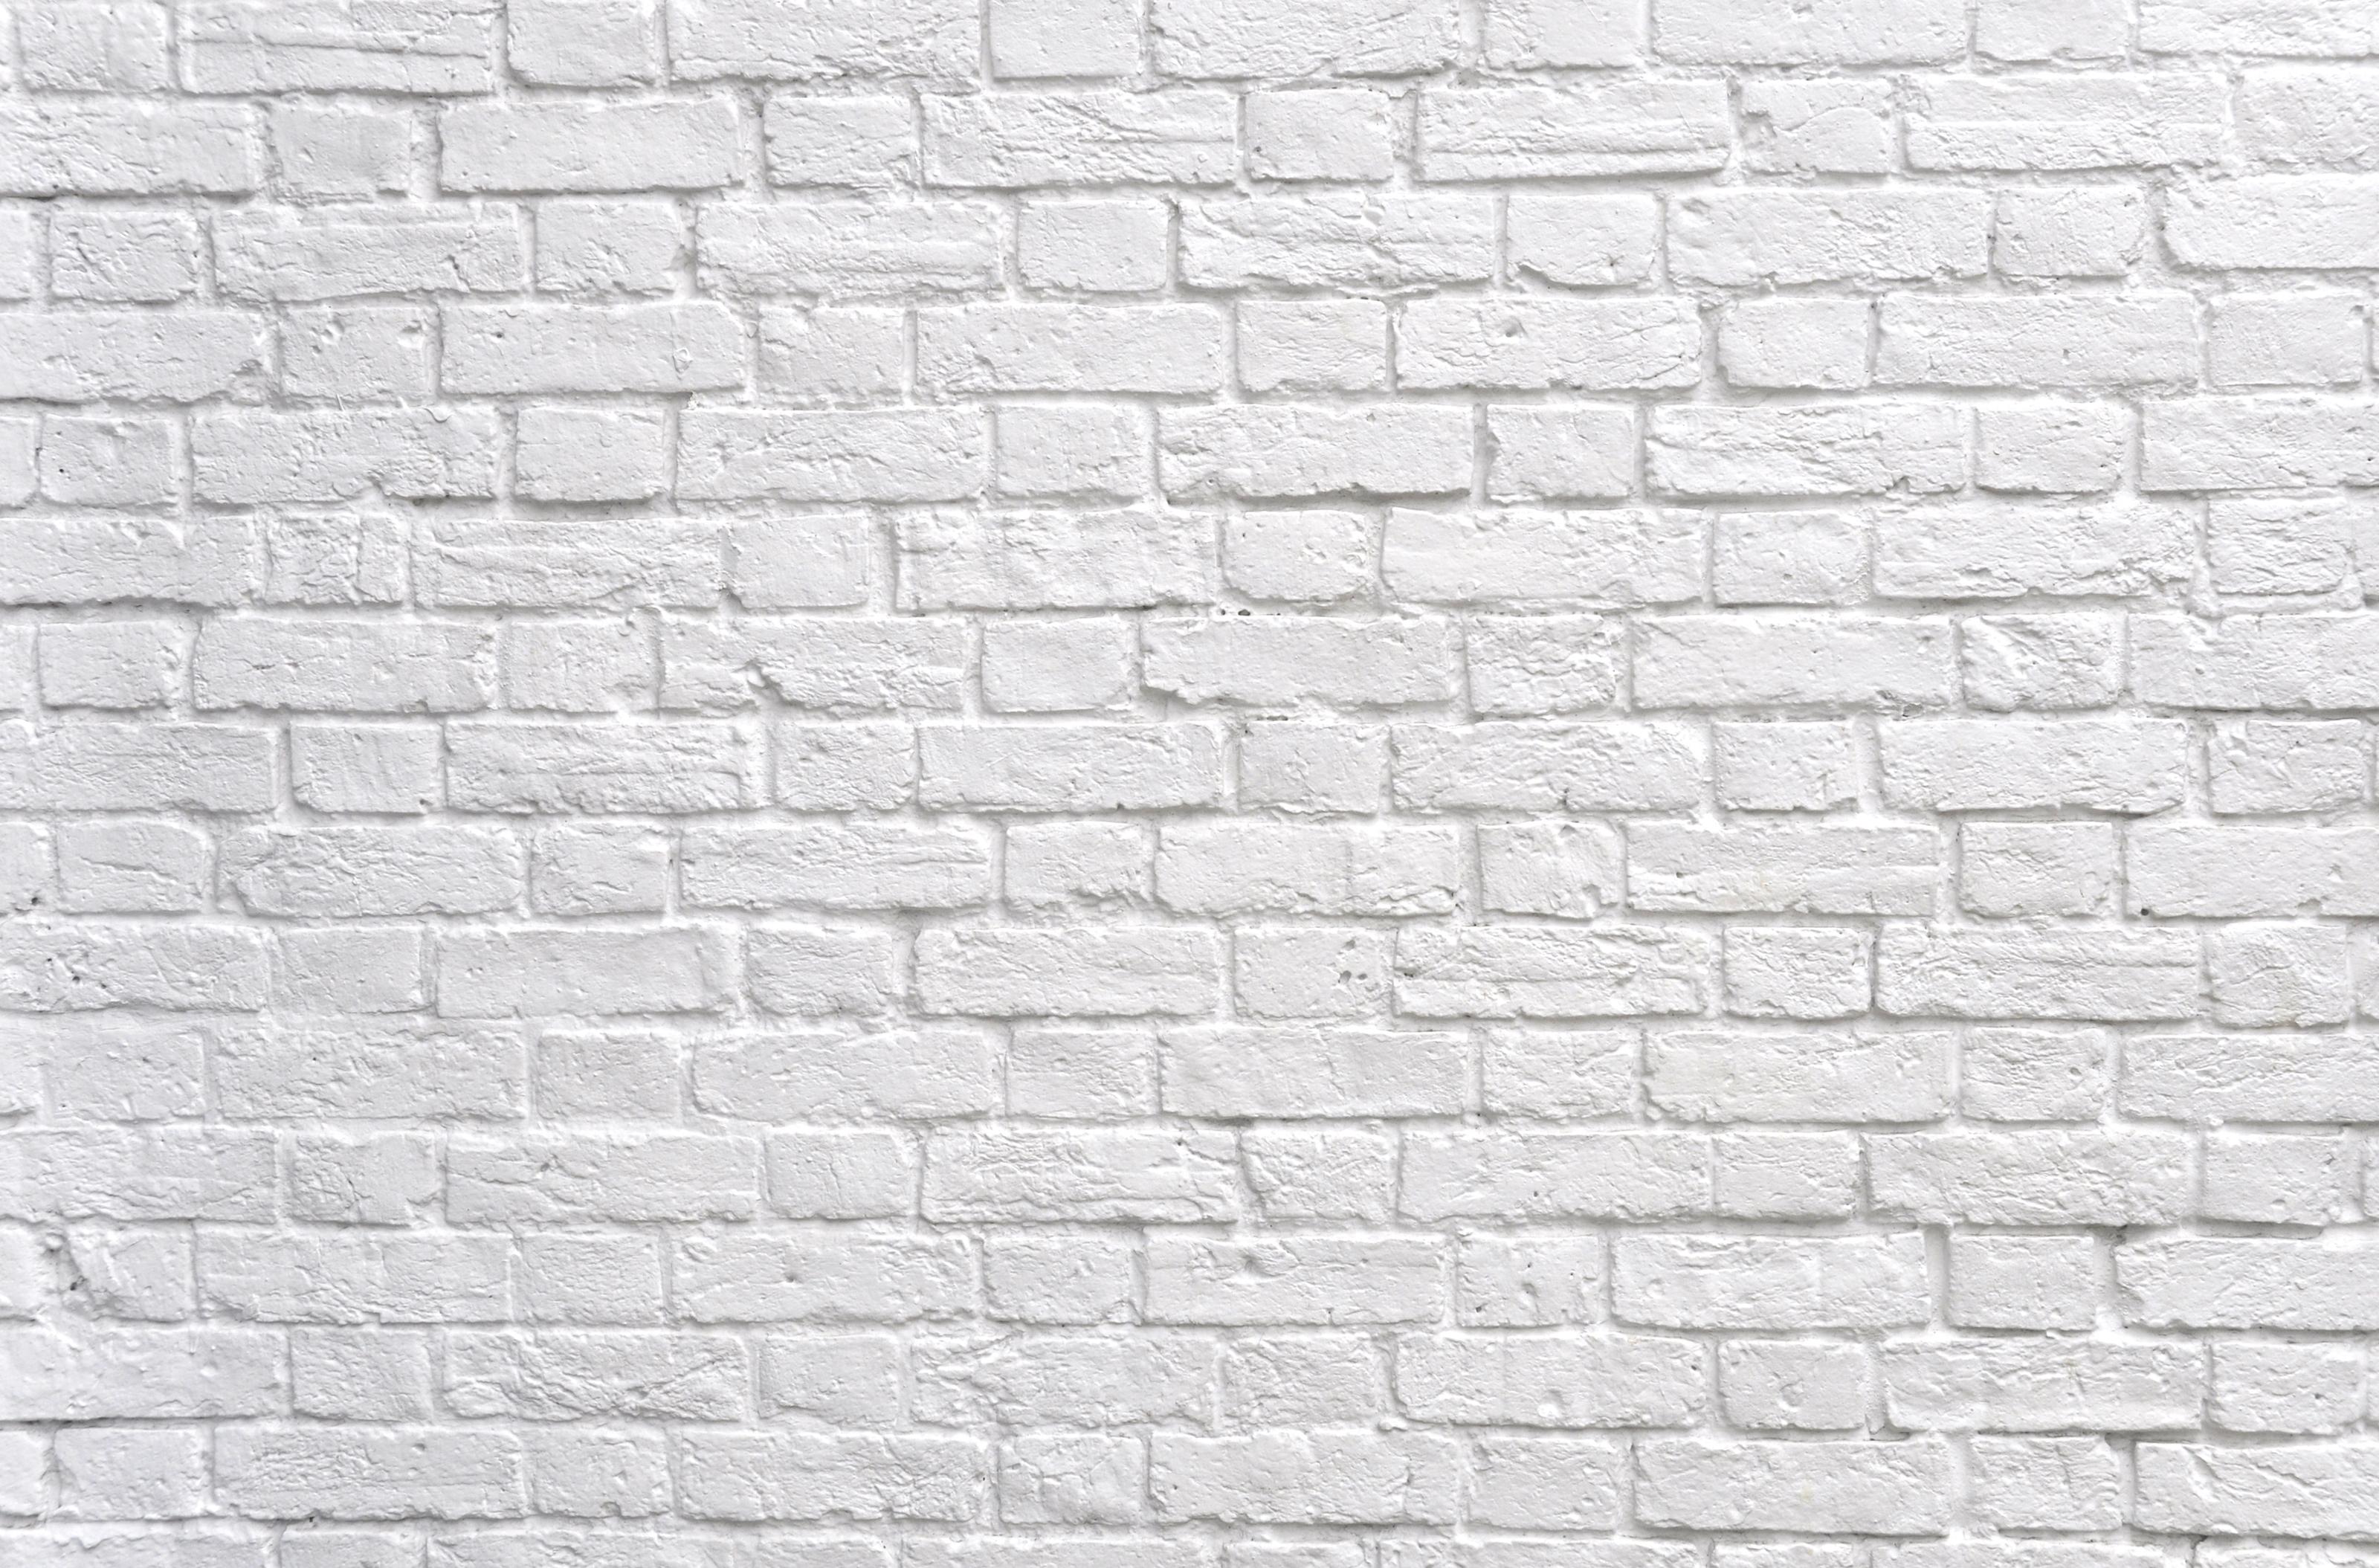 Black and white brick wall background white brick wall for Black and white wallpaper for walls